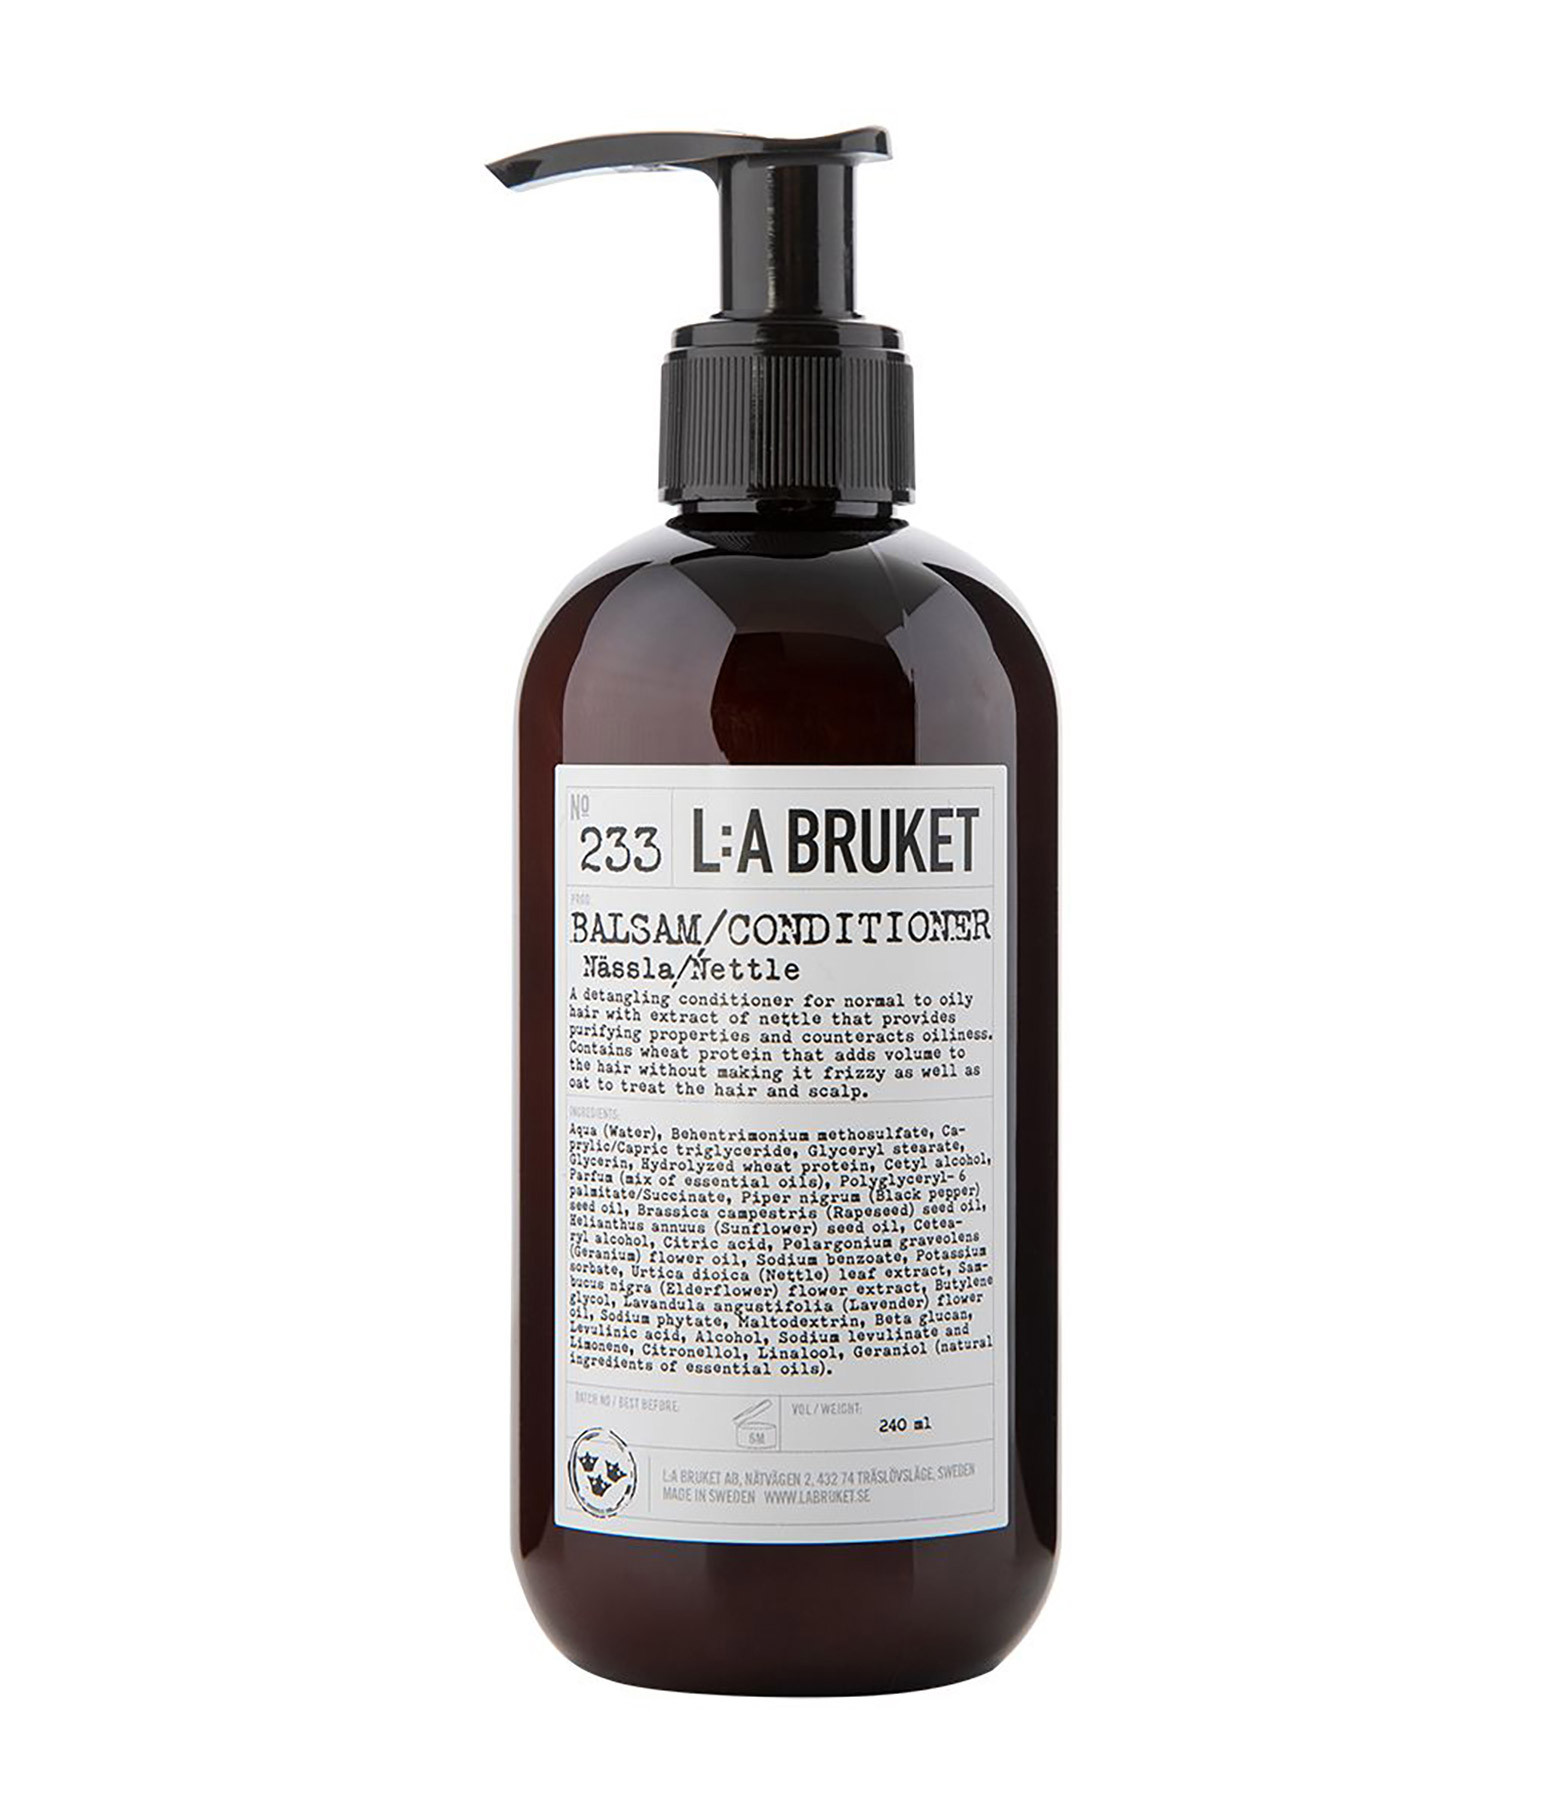 L:A BRUKET - Après-Shampoing Orties 240 ml N°233